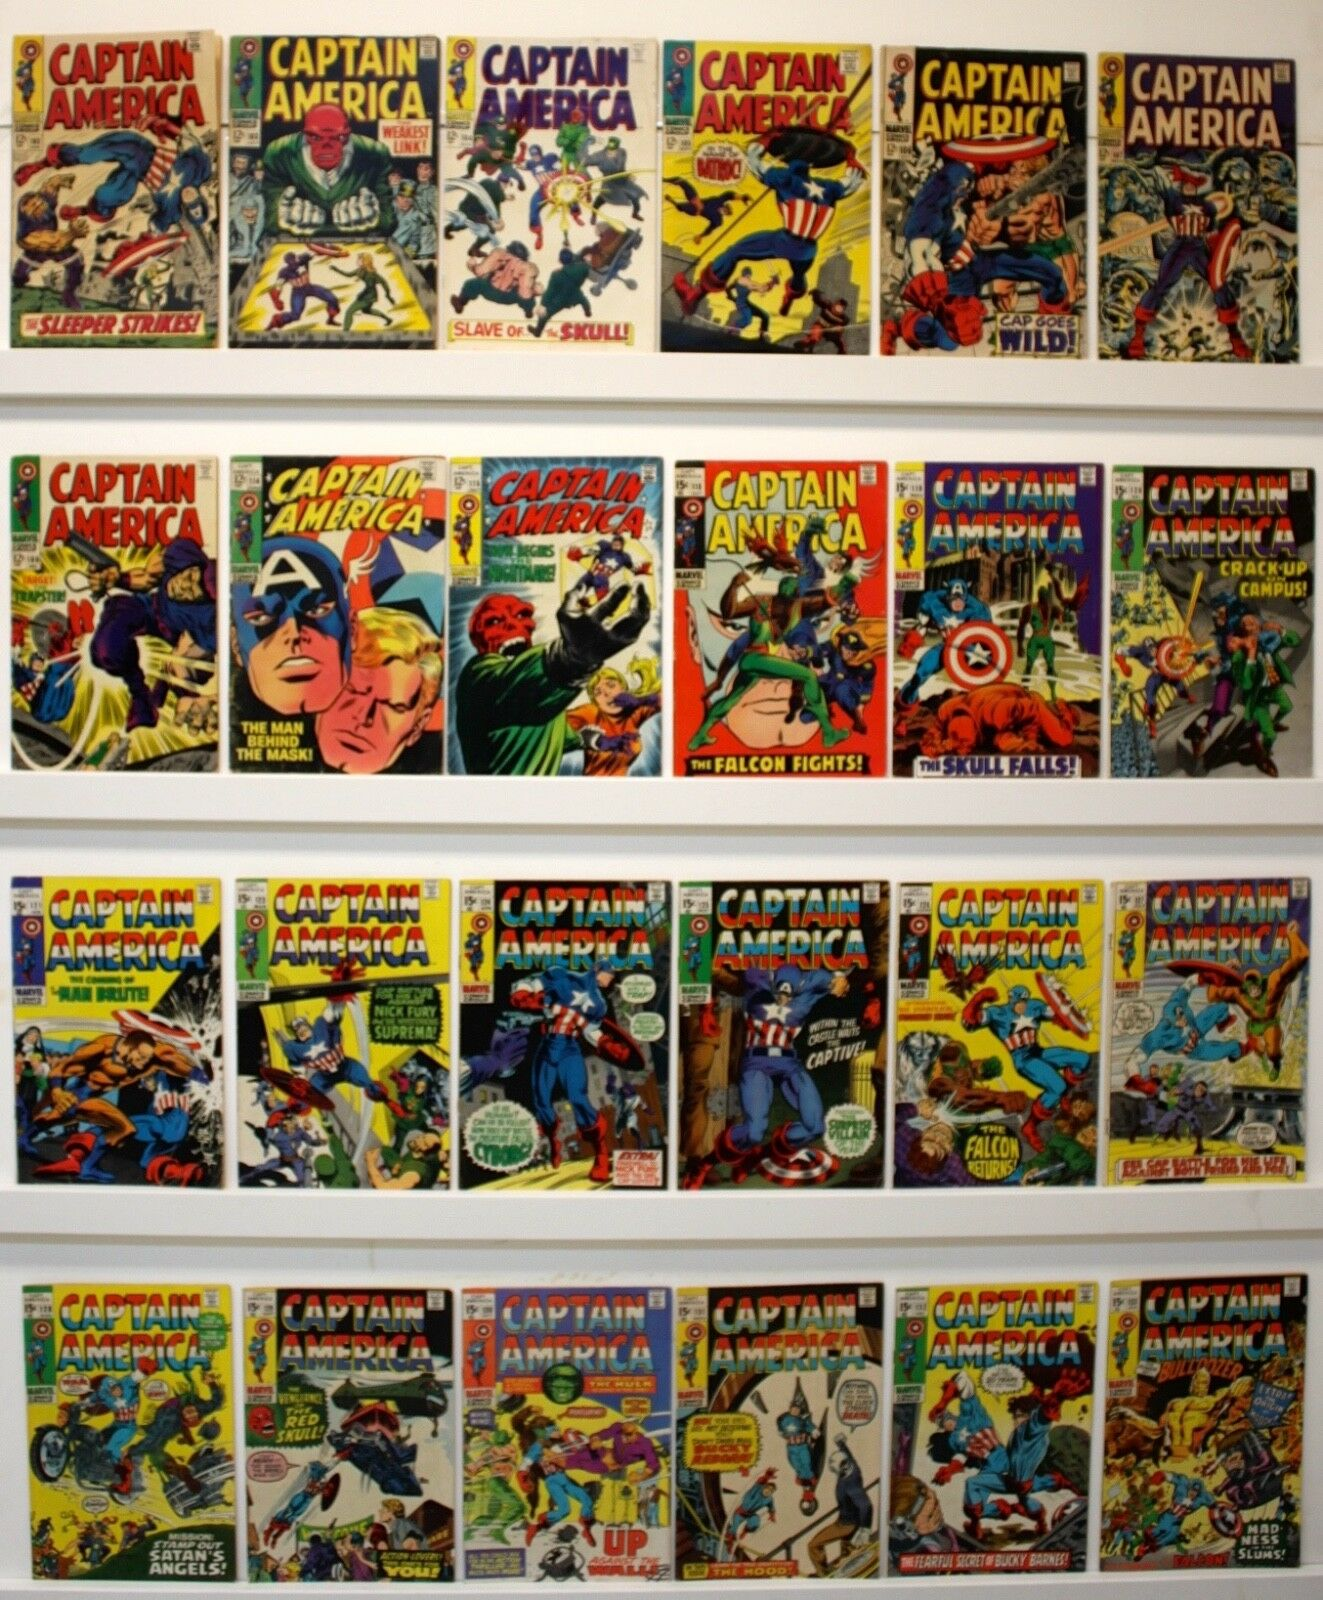 Captain America Lot of 24 comics  VG or better #102-108, 114-5, 118-121, 123-133